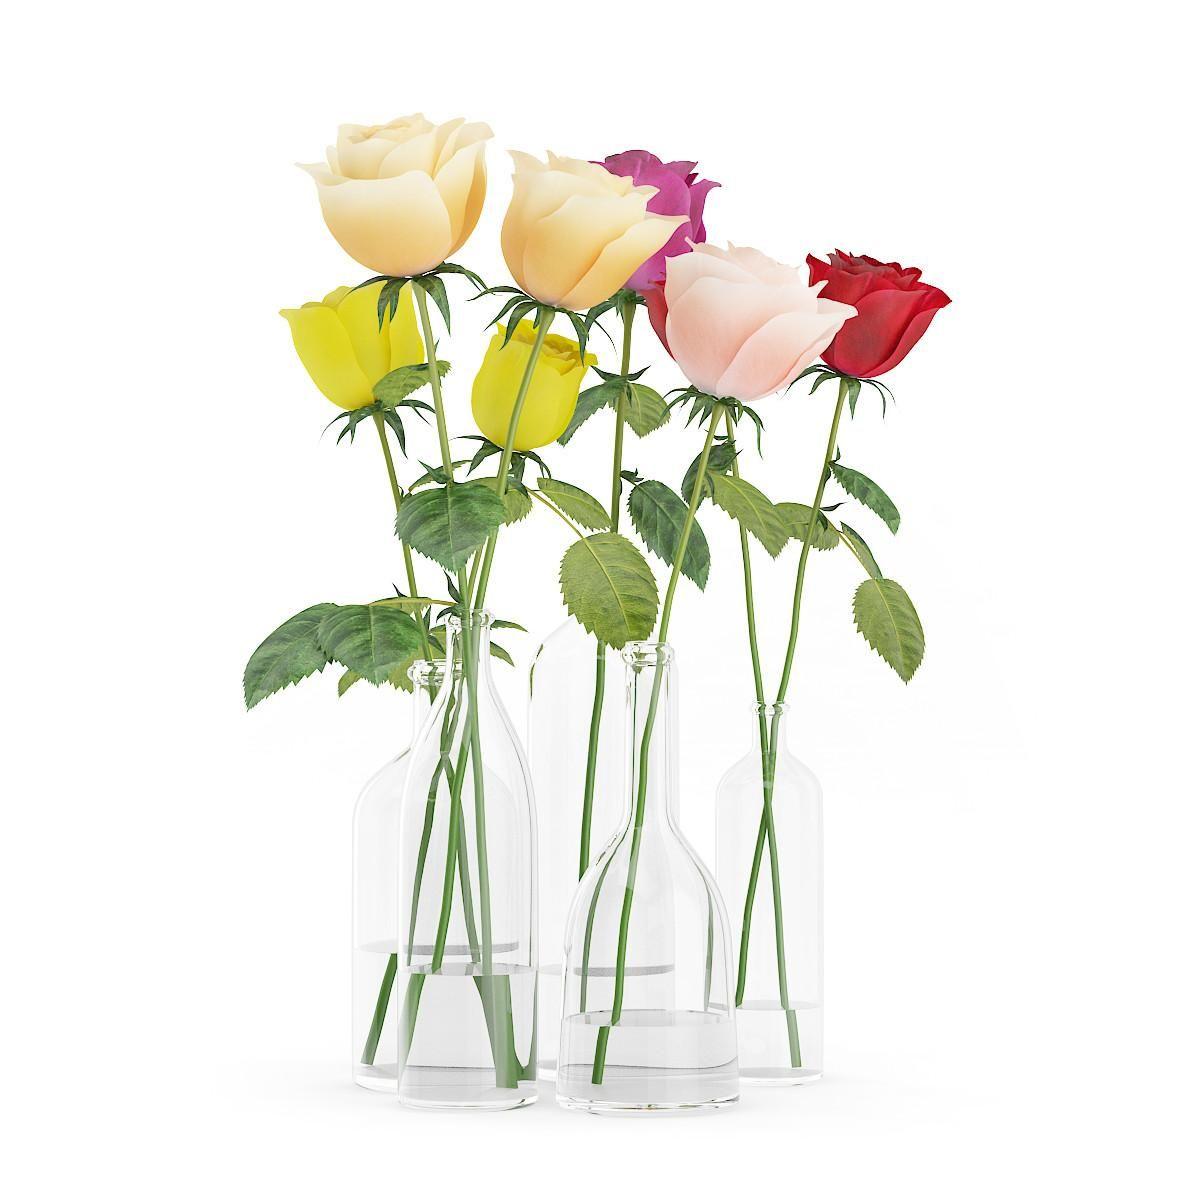 Roses In Glass Vases 3d Model Ad Glass Roses Model Vases Glass Vase Vase Rose Decor